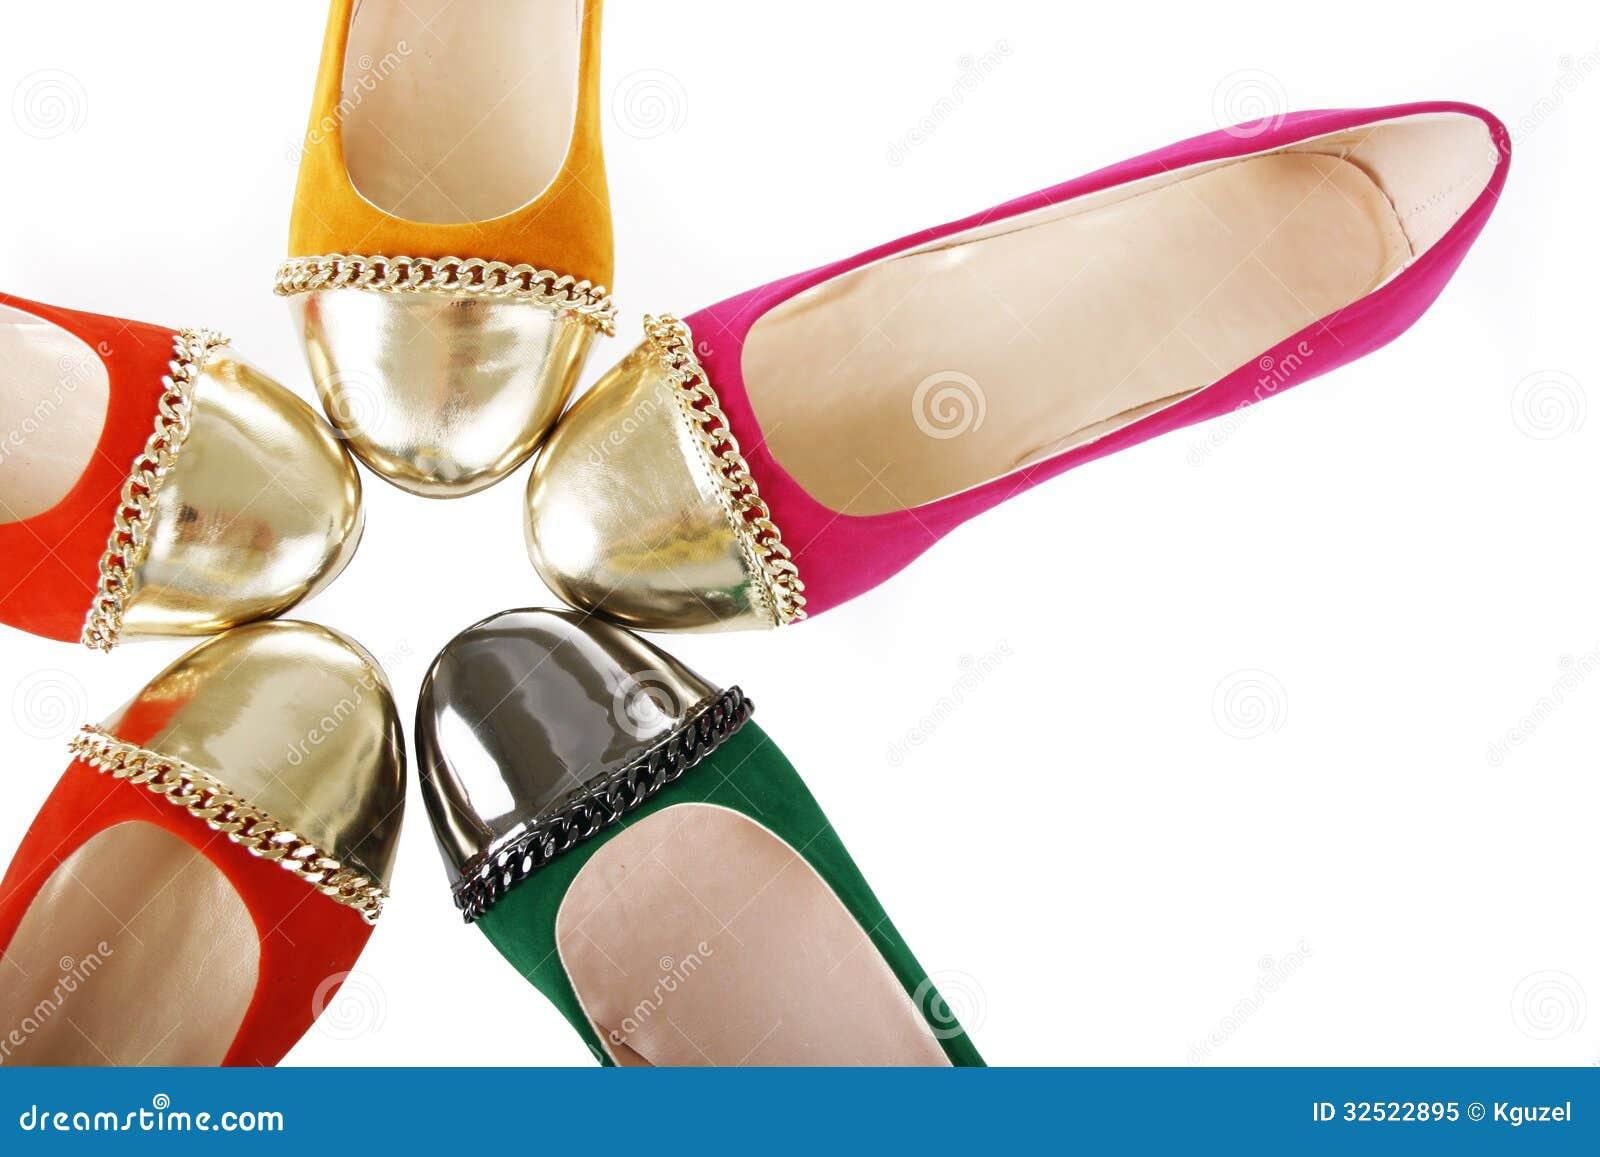 Shoe flats. Women shoes online